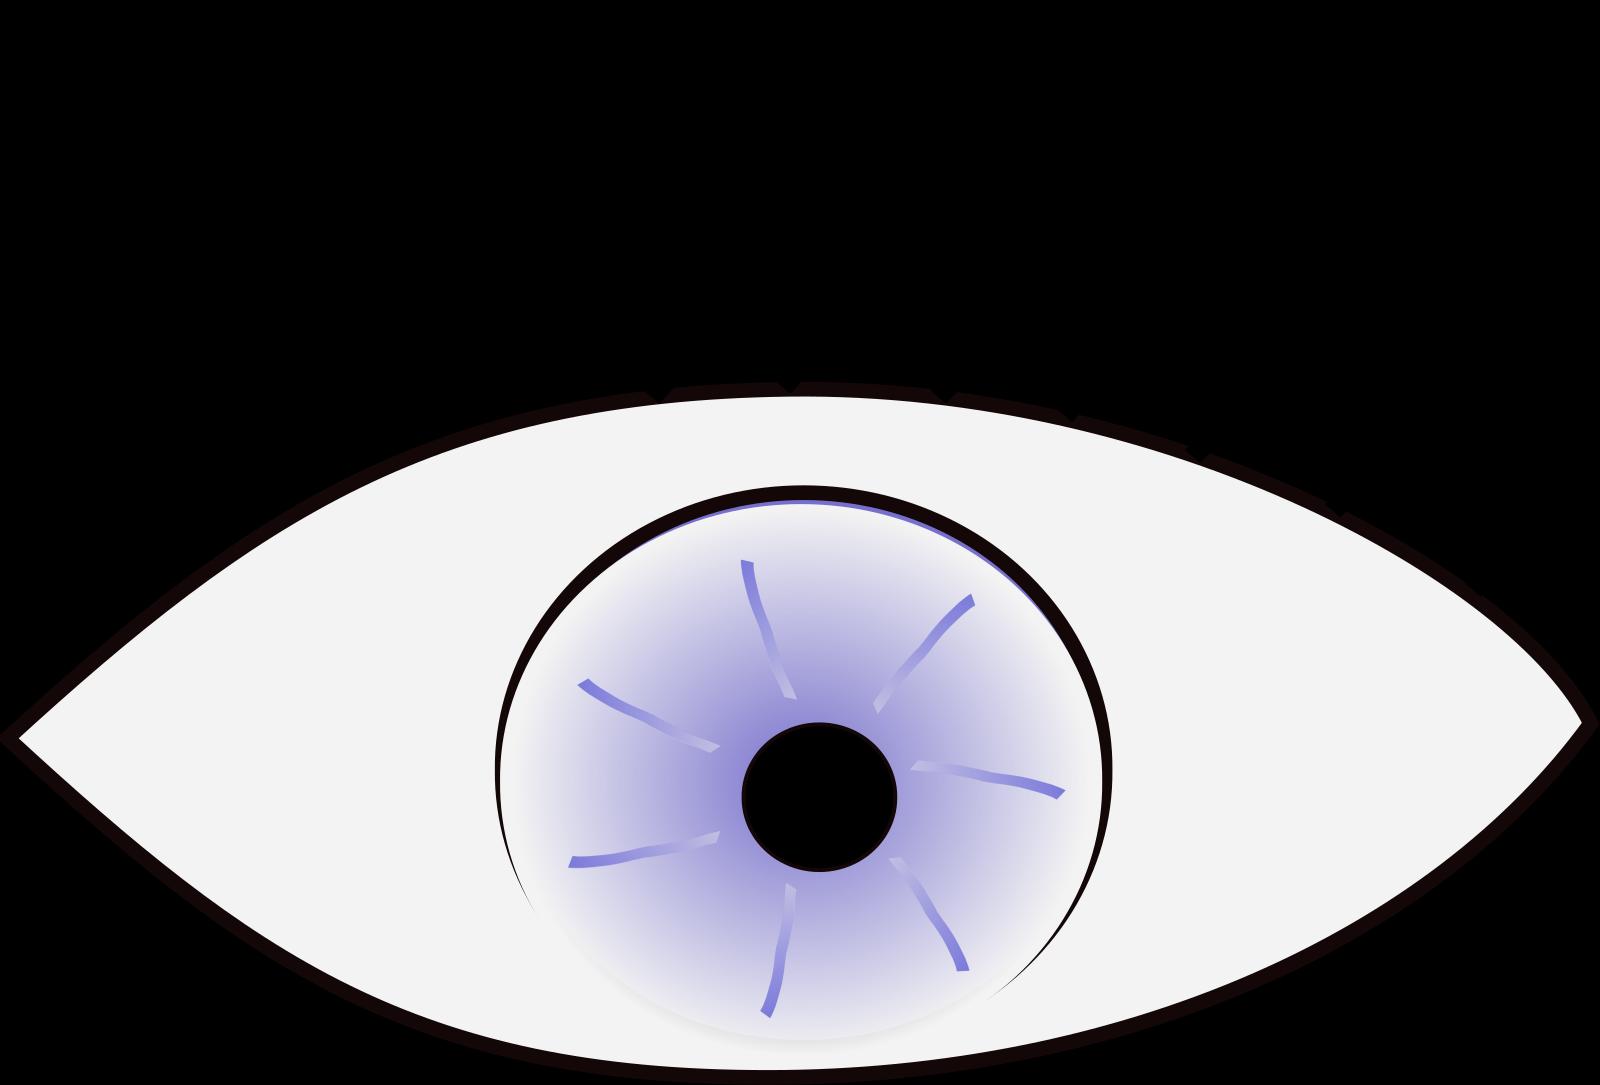 Eye Sketch Png Svg Clip Art For Web Download Clip Art Png Icon Arts